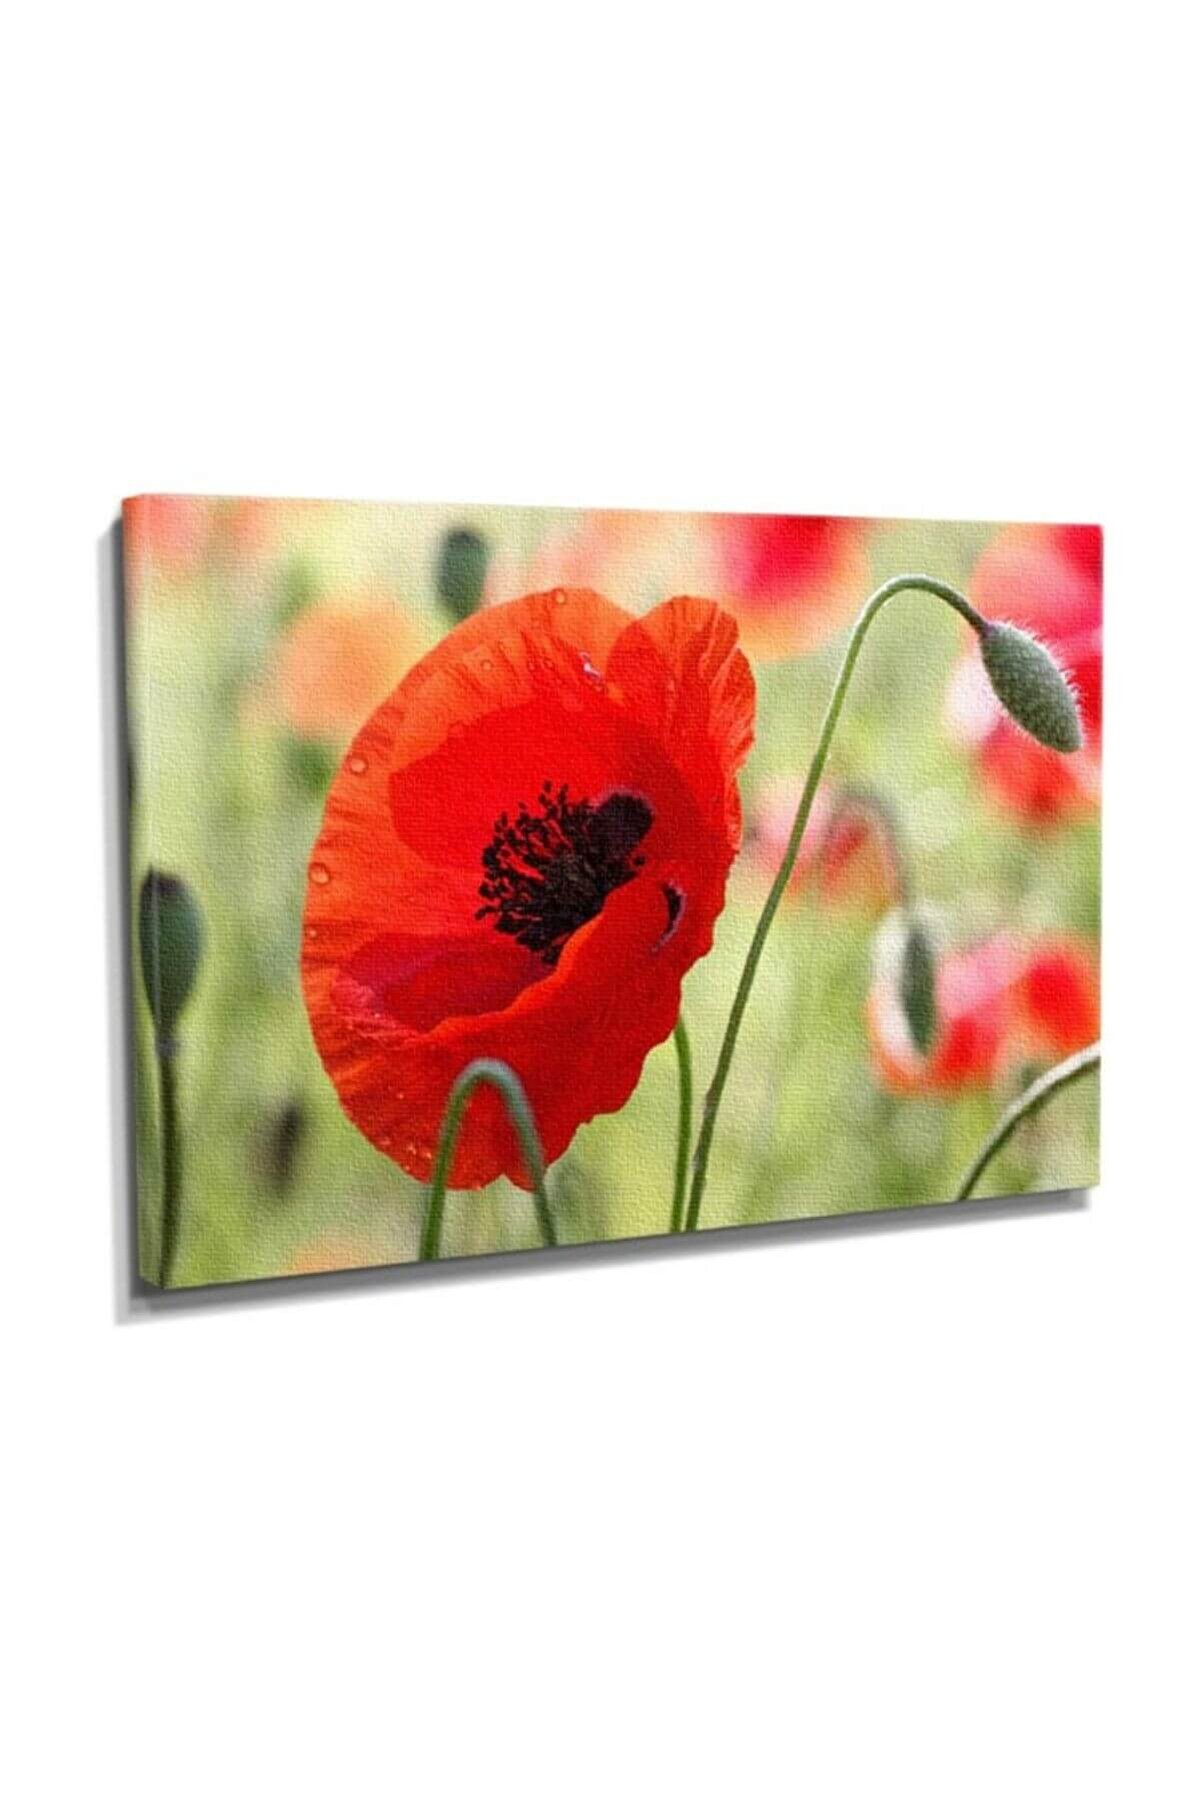 Dekor Sevgisi Gelincik Canvas Tablo  60x40 DTC145301364